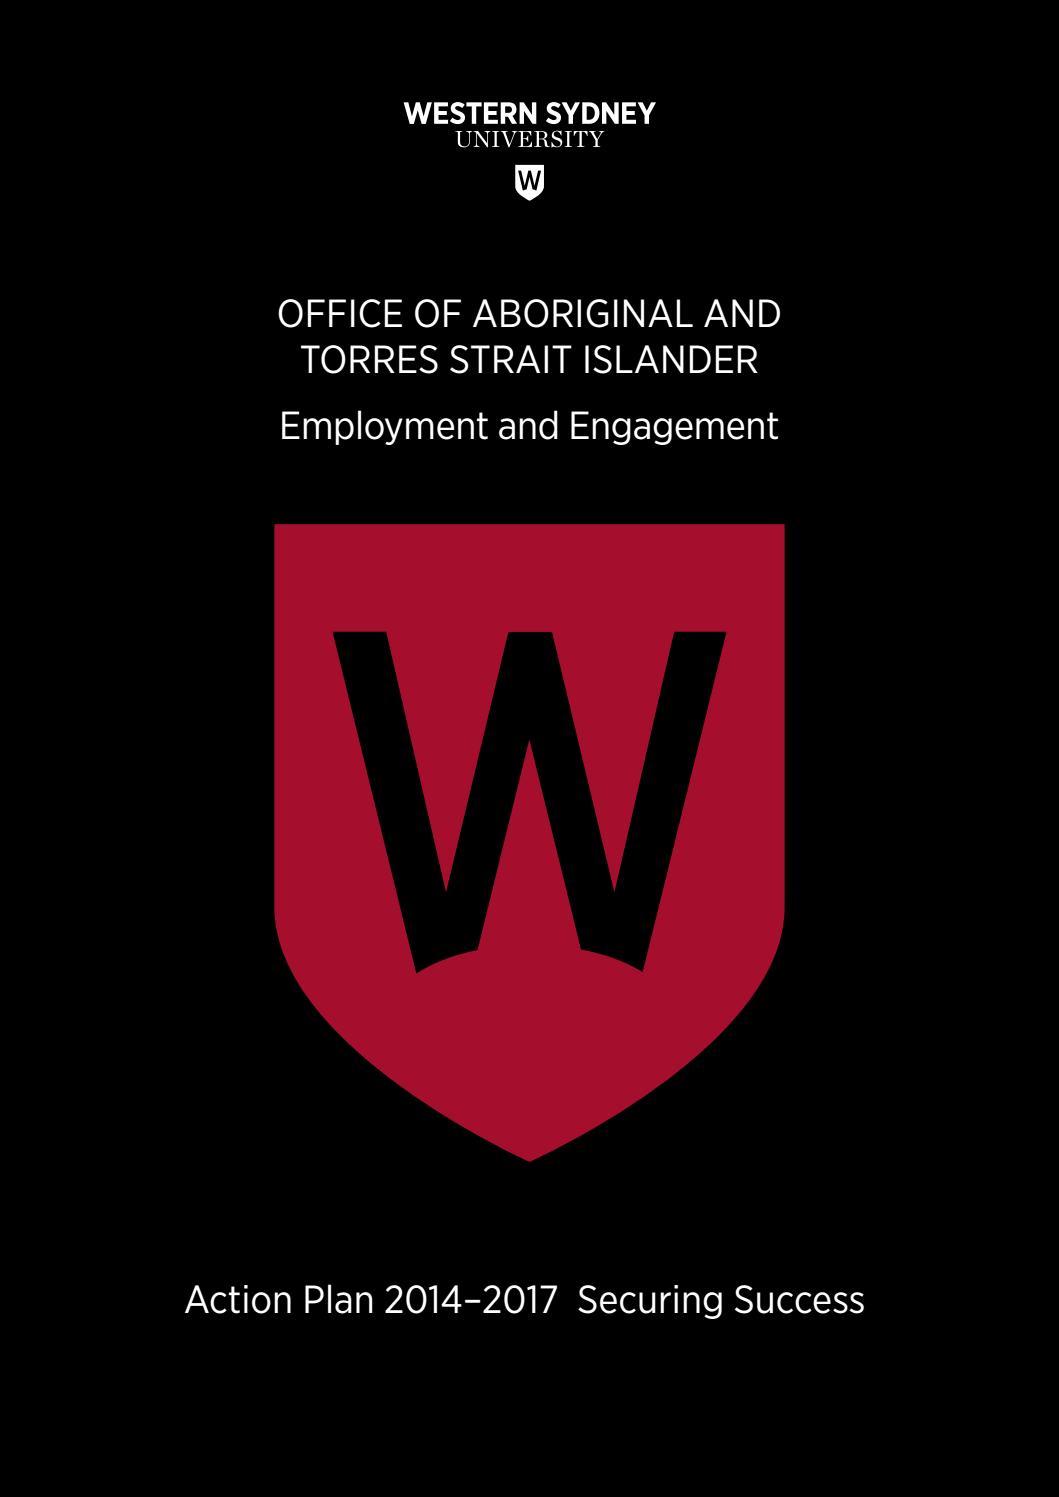 Western Sydney University Office of Aboriginal and Torres